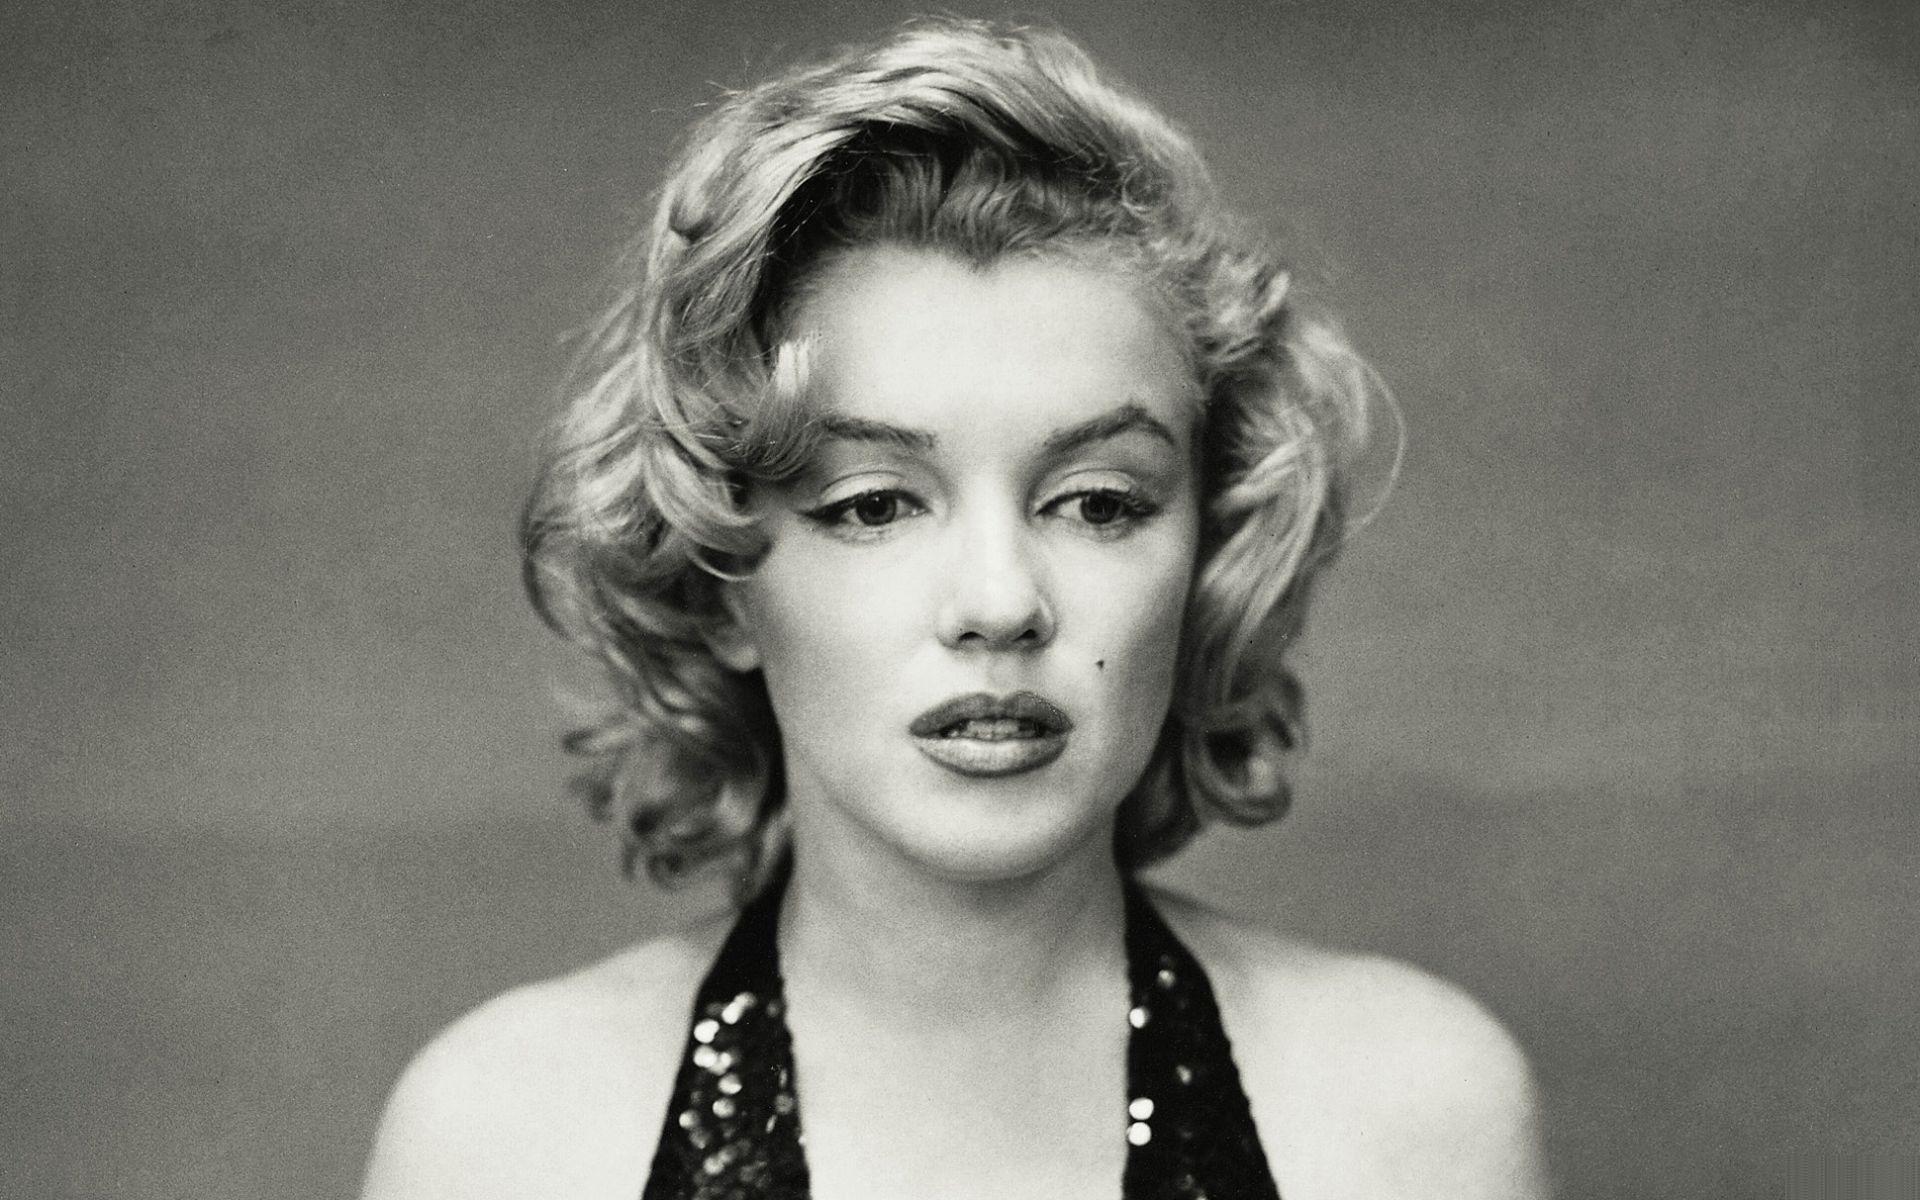 1920x1200 Black And White Marilyn Monroe Wallpaper Borde 14914 Full HD .